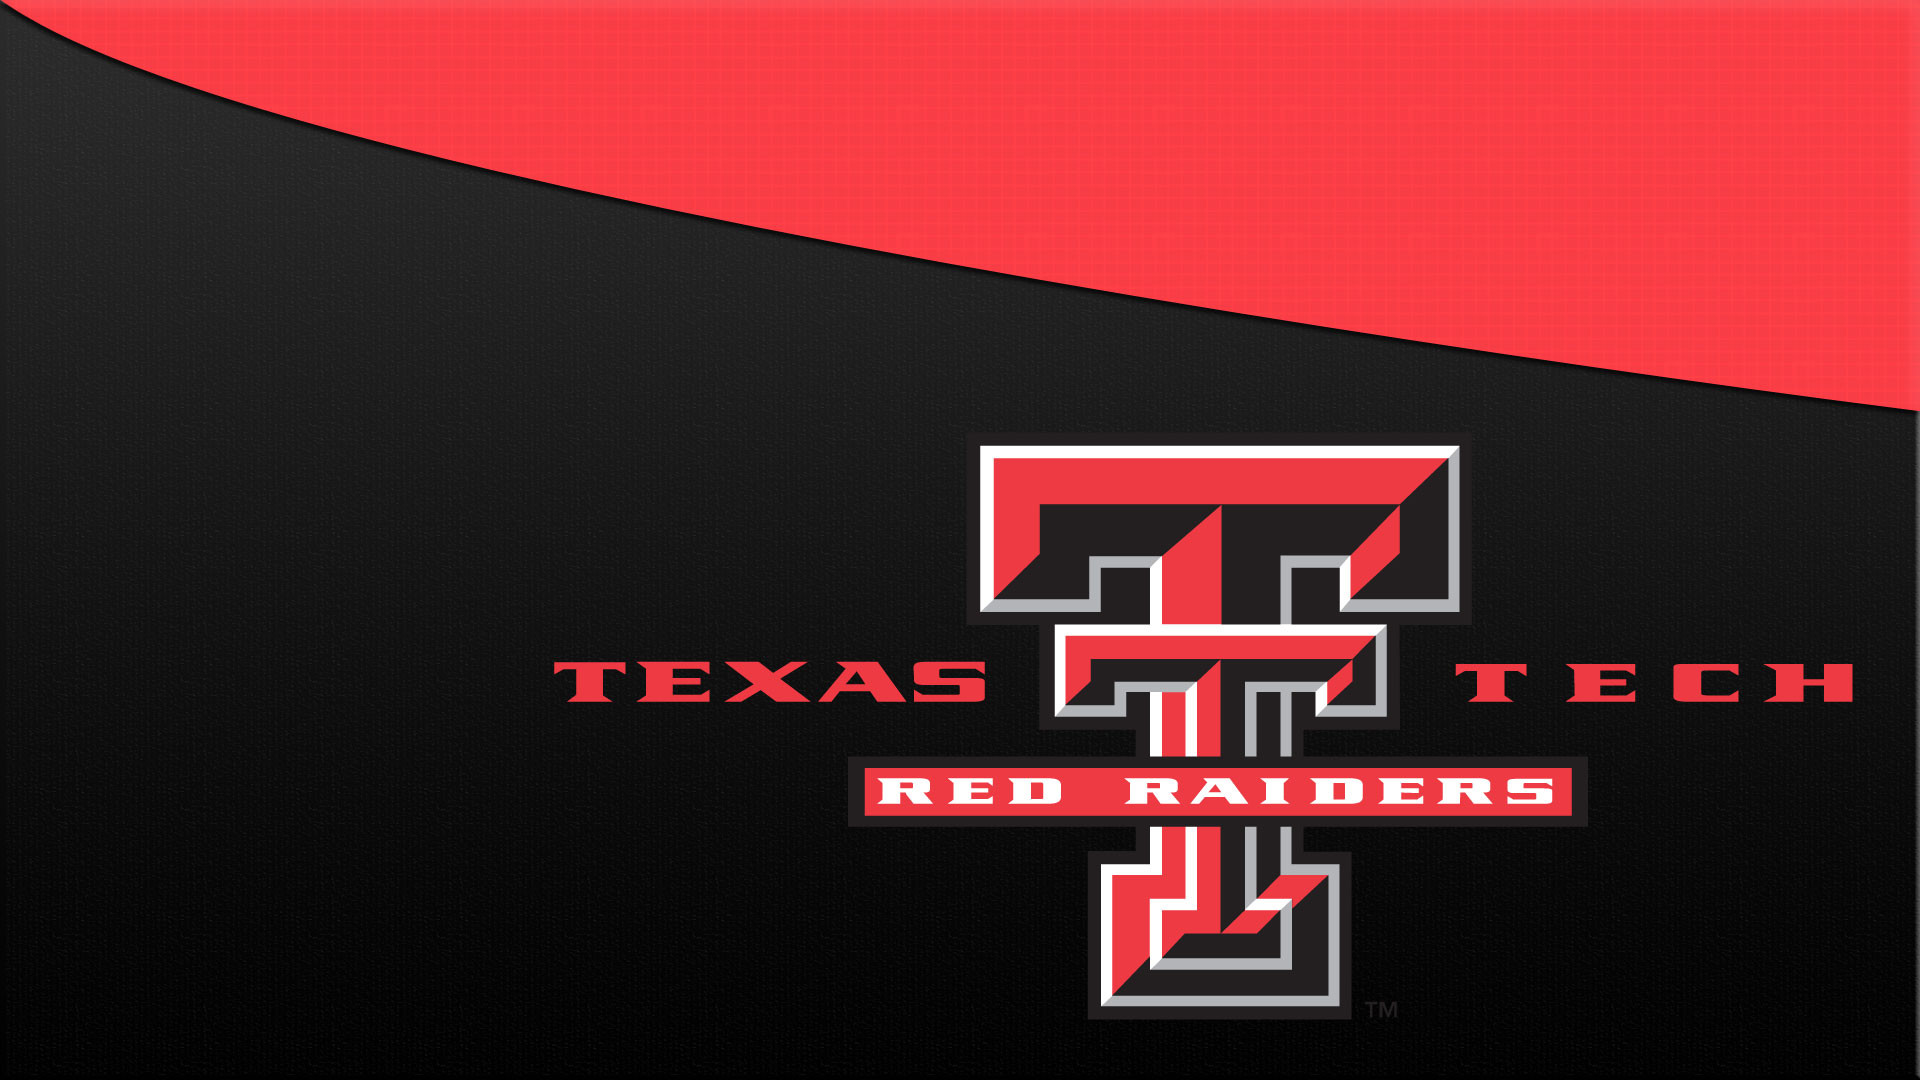 Res: 1920x1080, Texas Tech Red Raiders Logo 1920×1080 Wallpaper